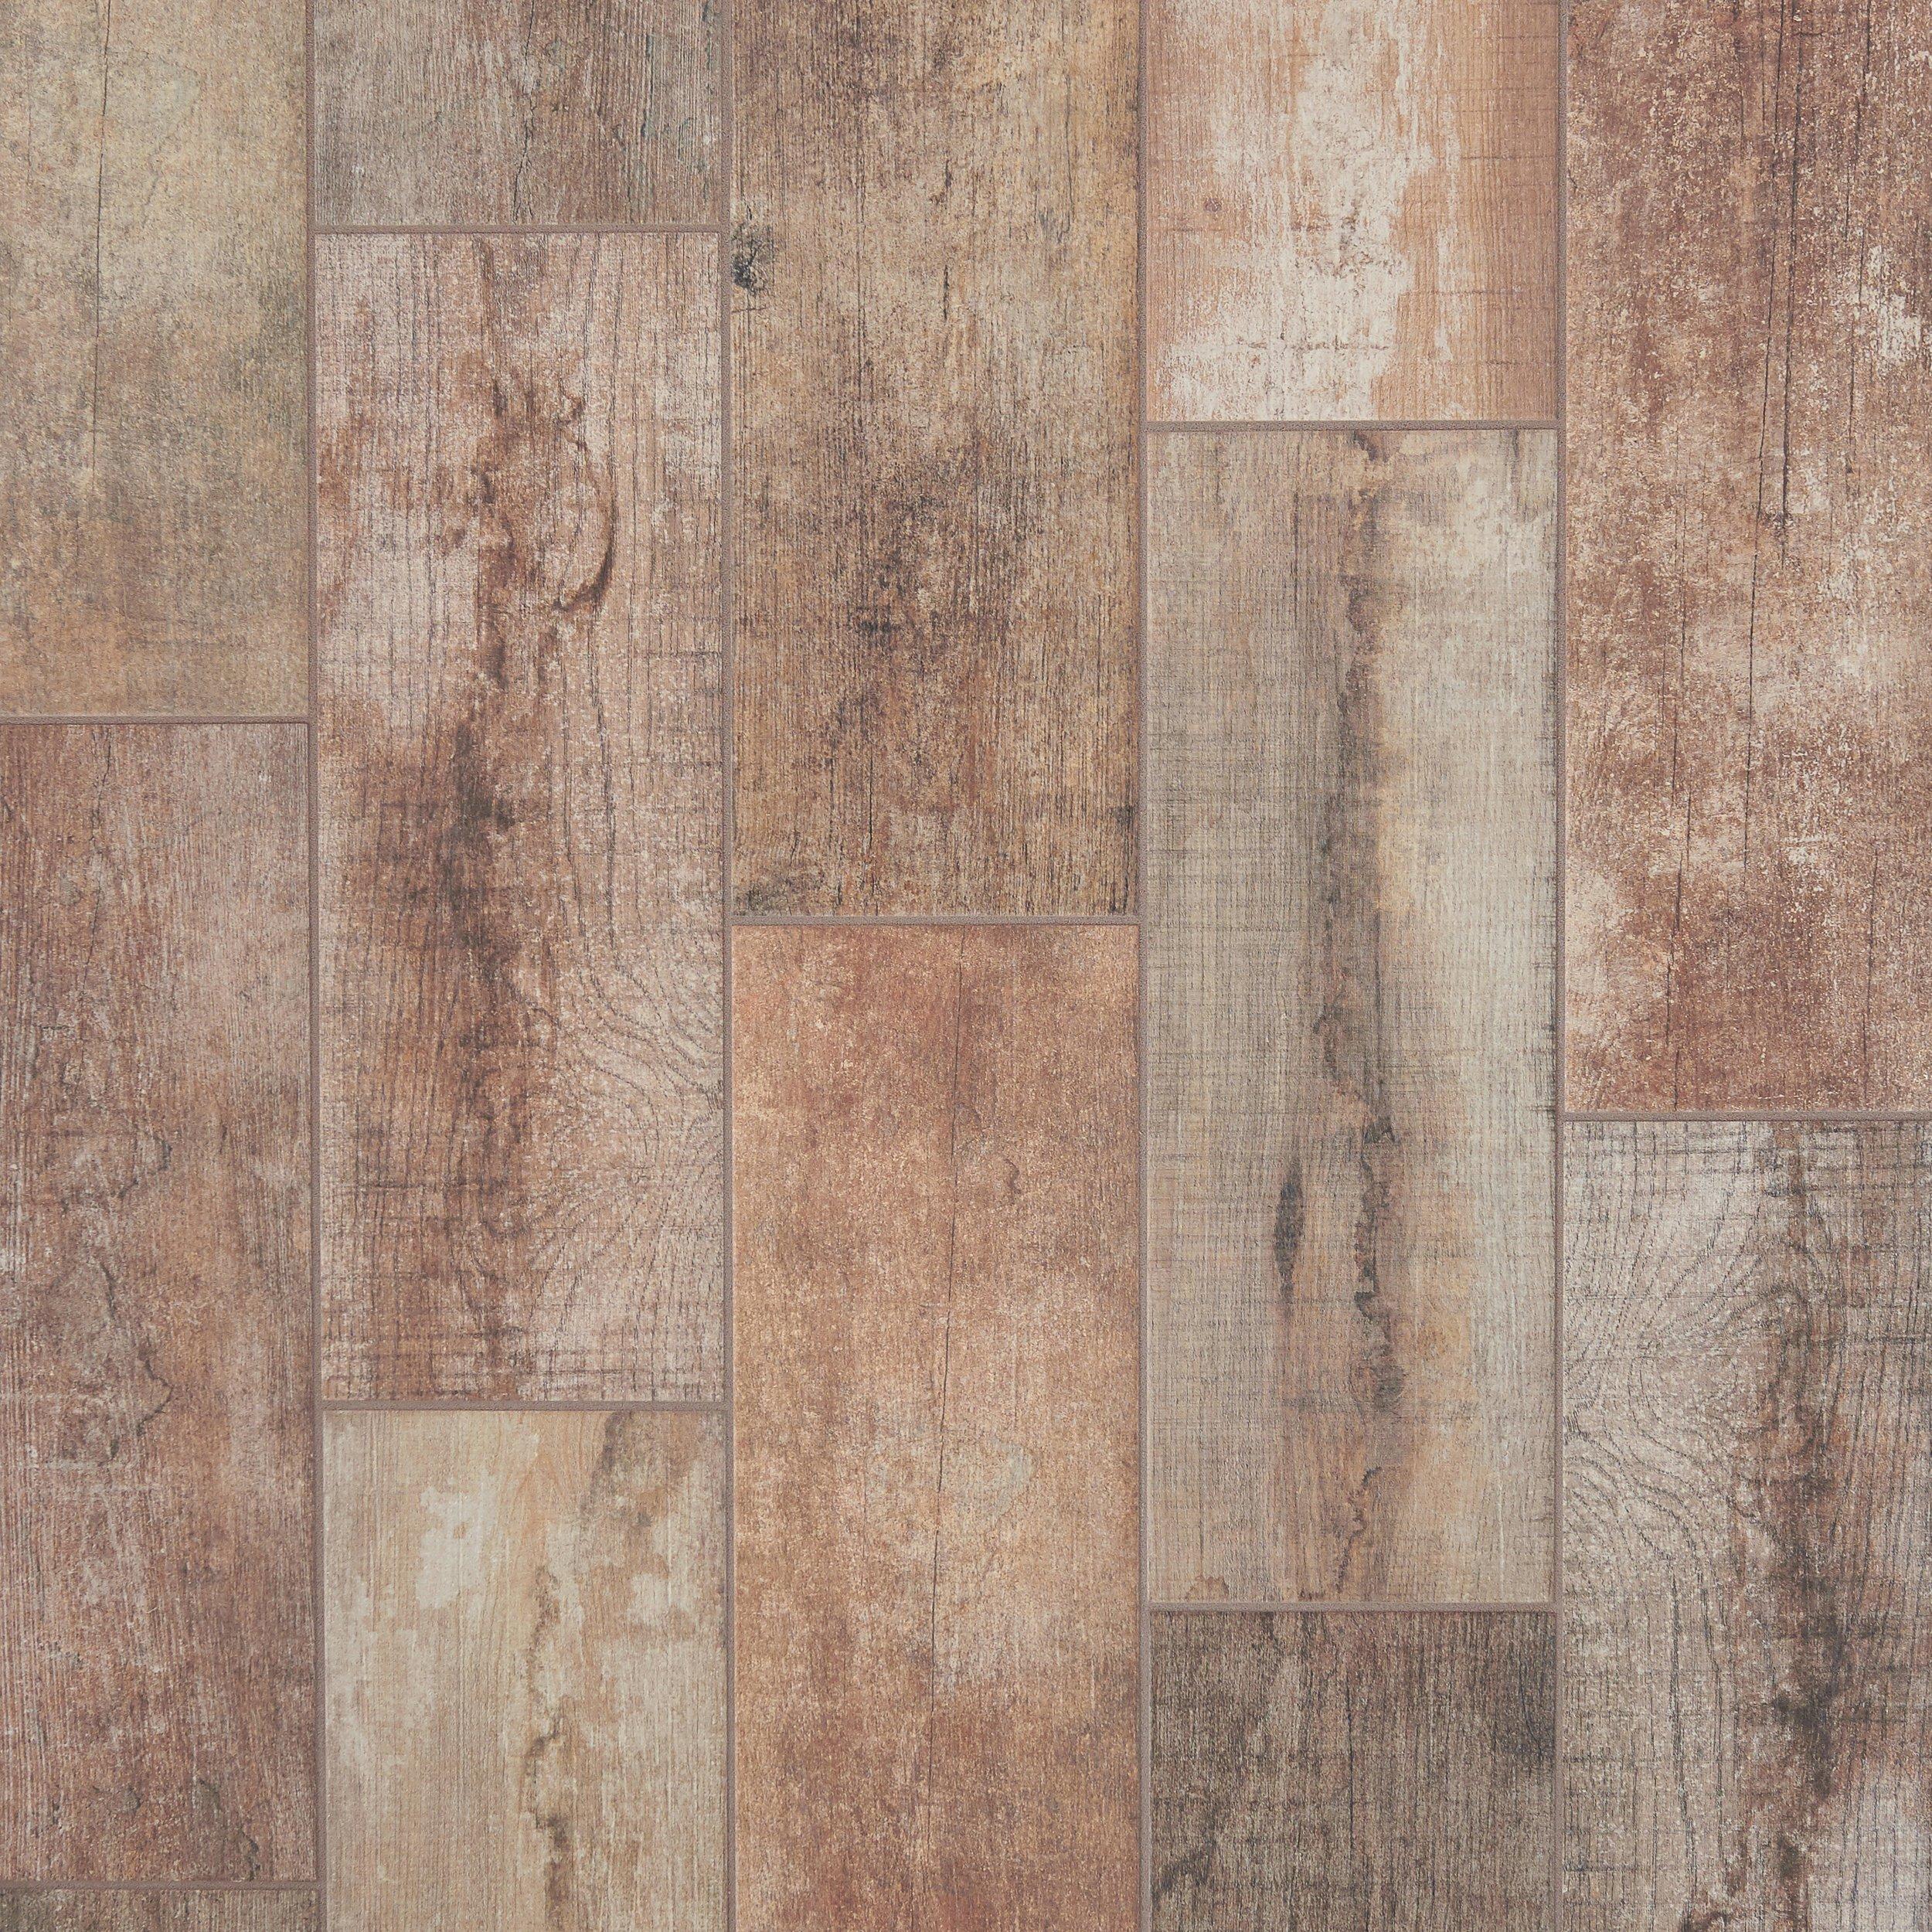 tiles and wood jp tile flooring floor ceramic floors feature custom grey lowes